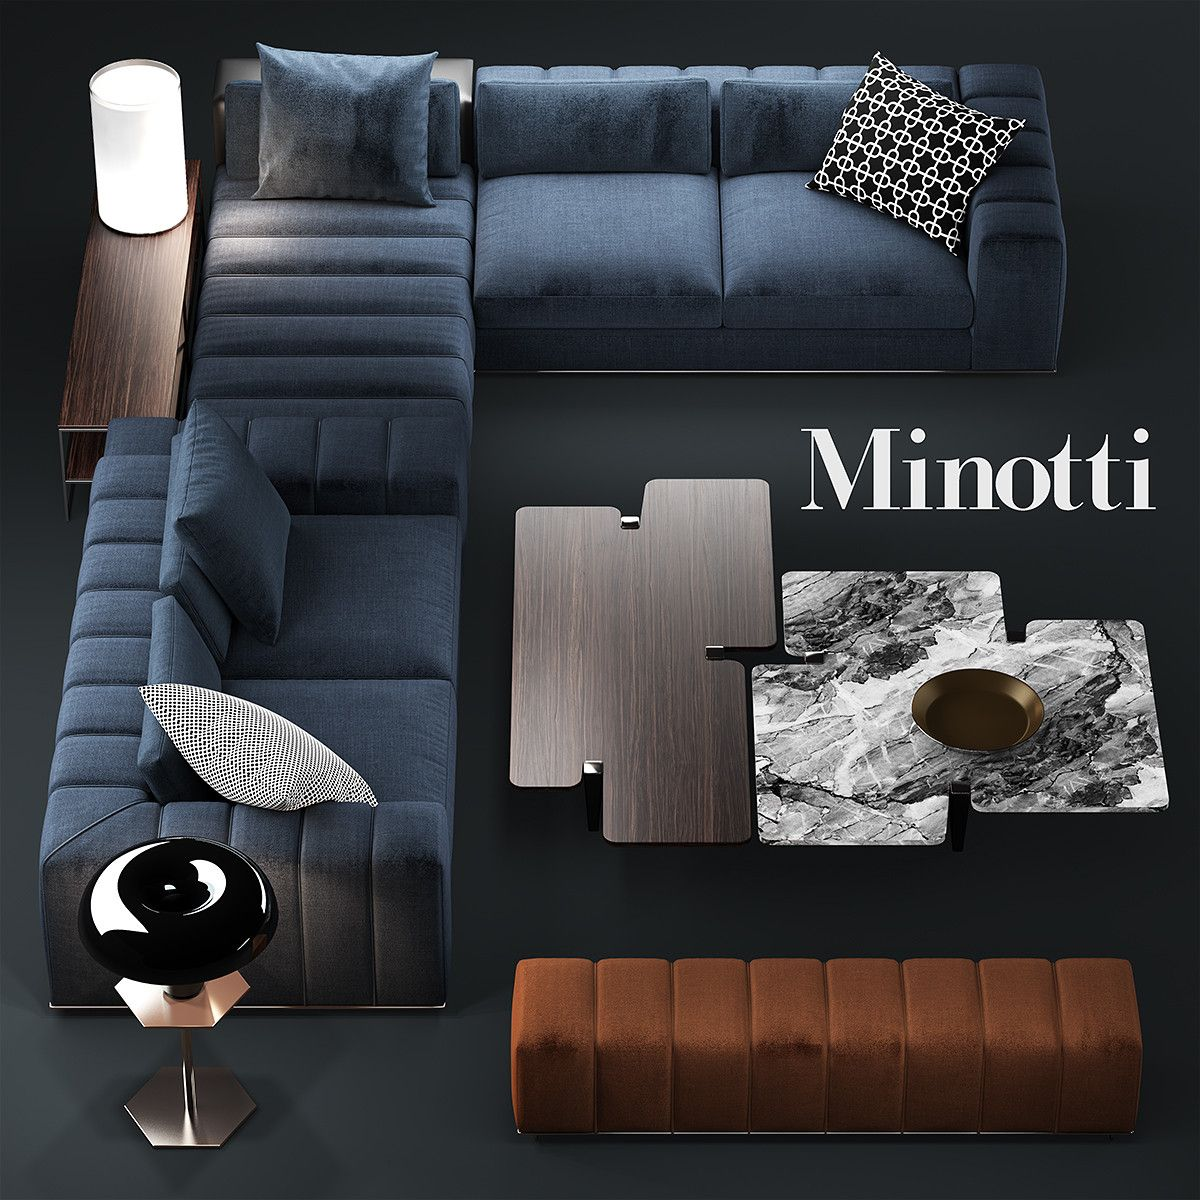 3d Sofa Minotti Freeman Model Furniture Living Room